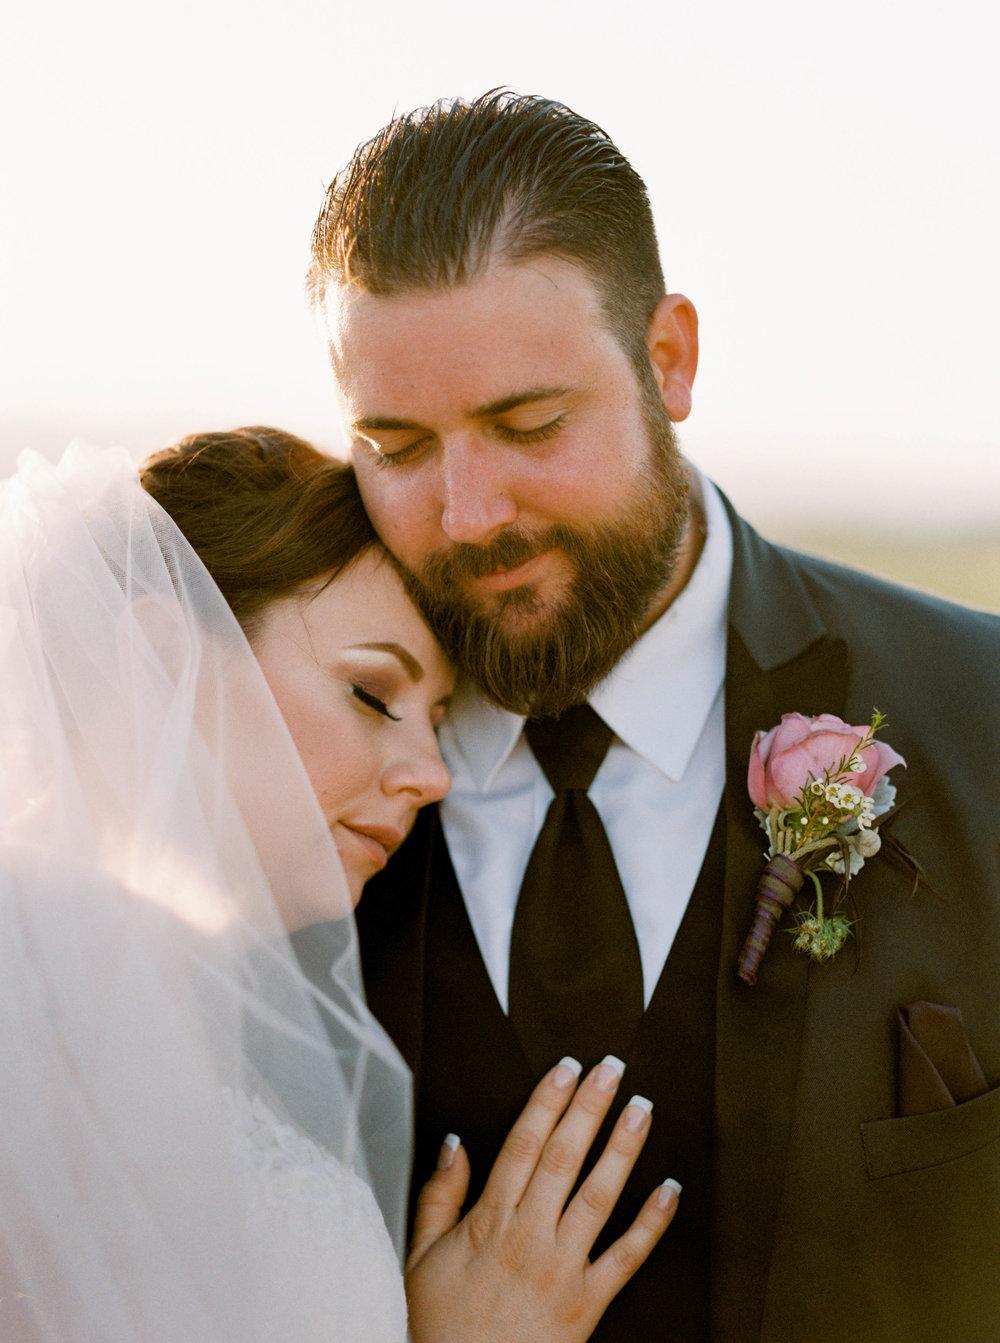 DennisRoyCoronel_Photography_taberranch_Wedding-19.jpg